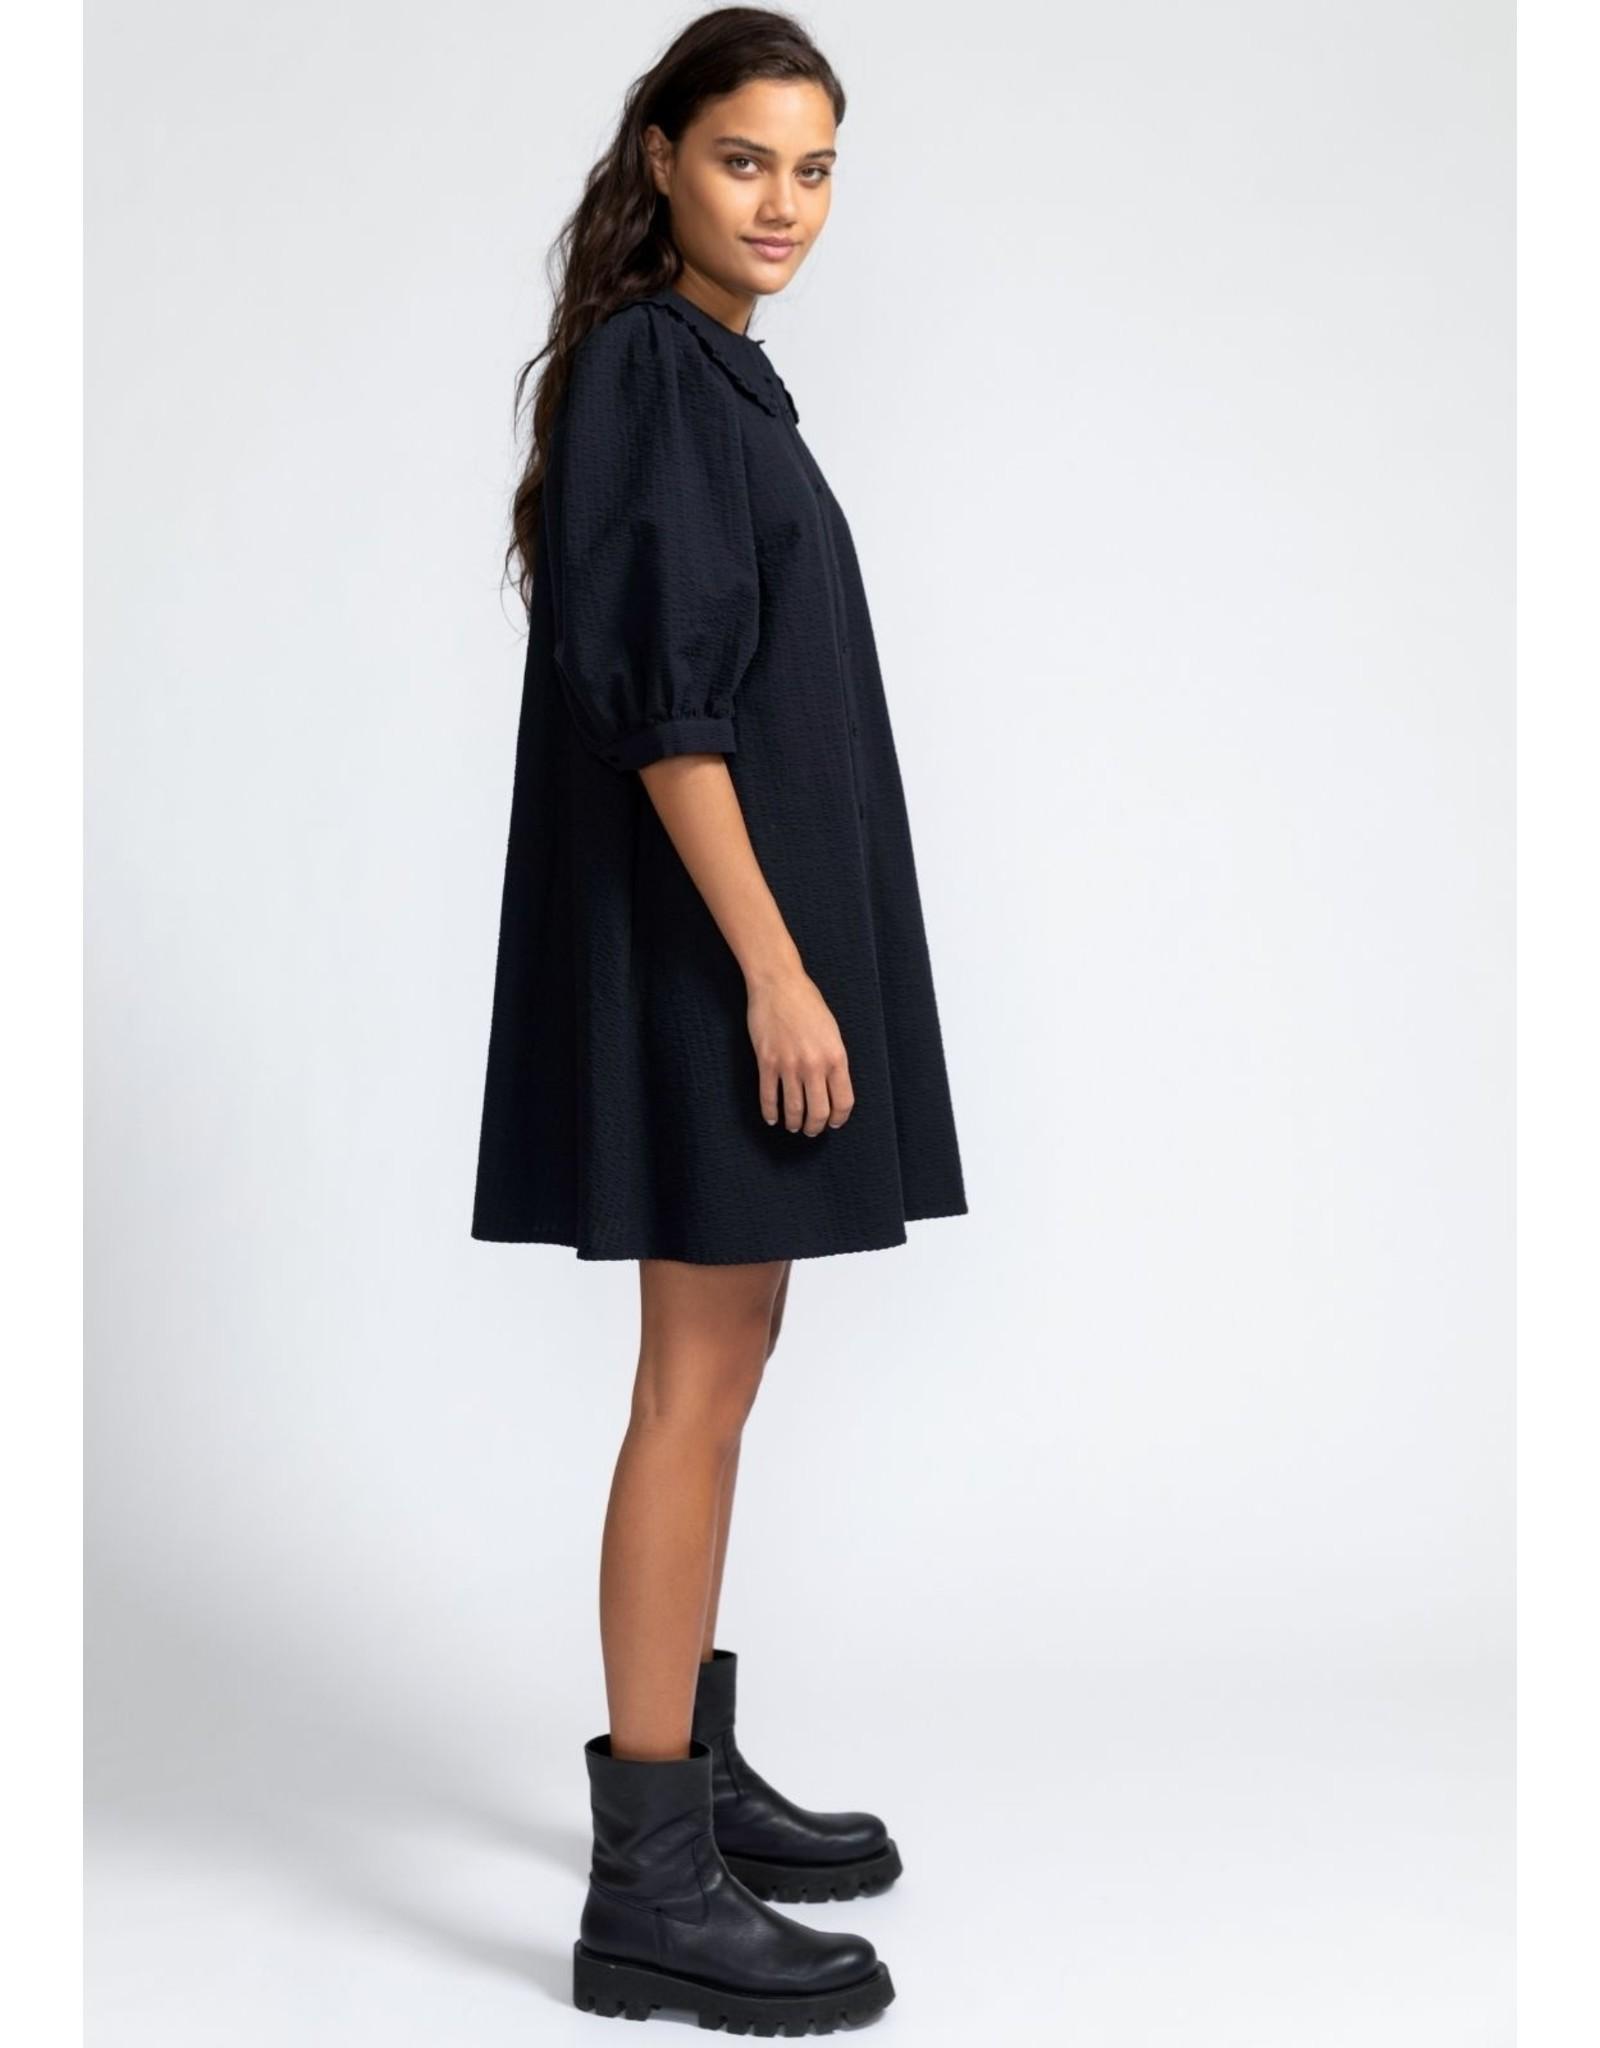 LIV THE LABEL LUCY DRESS  BLACK